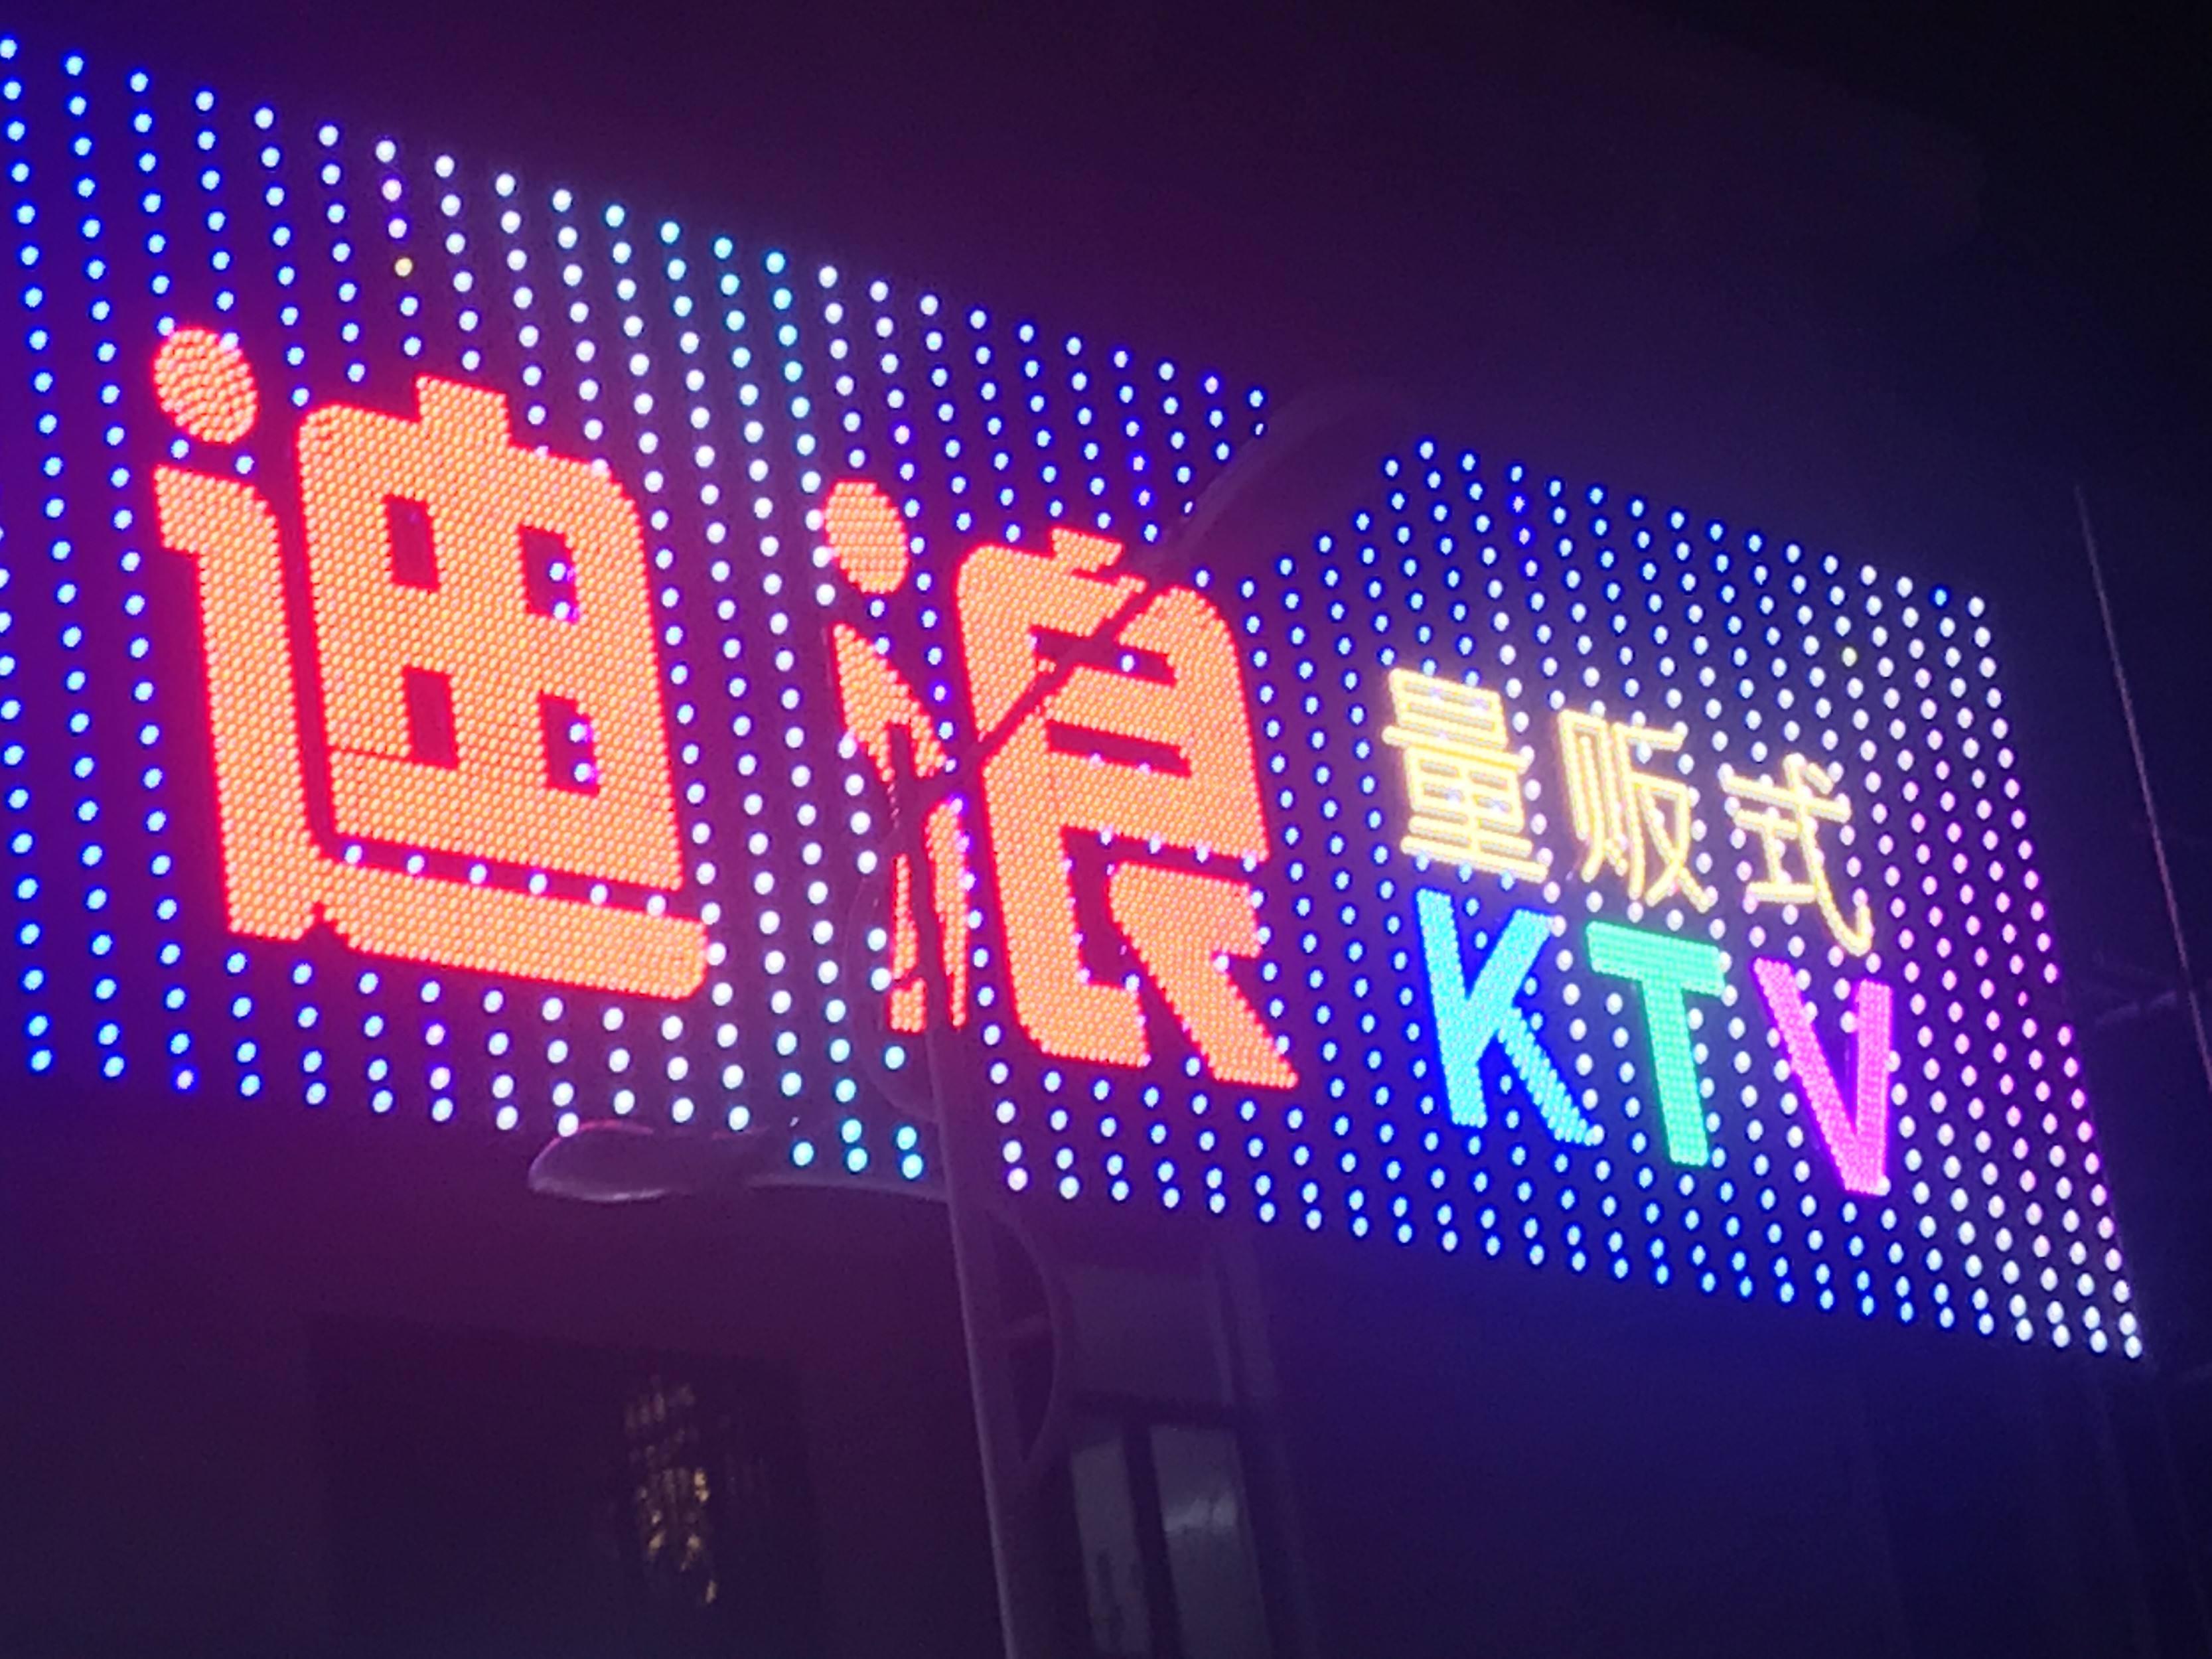 title='南昌迪浪KTV'